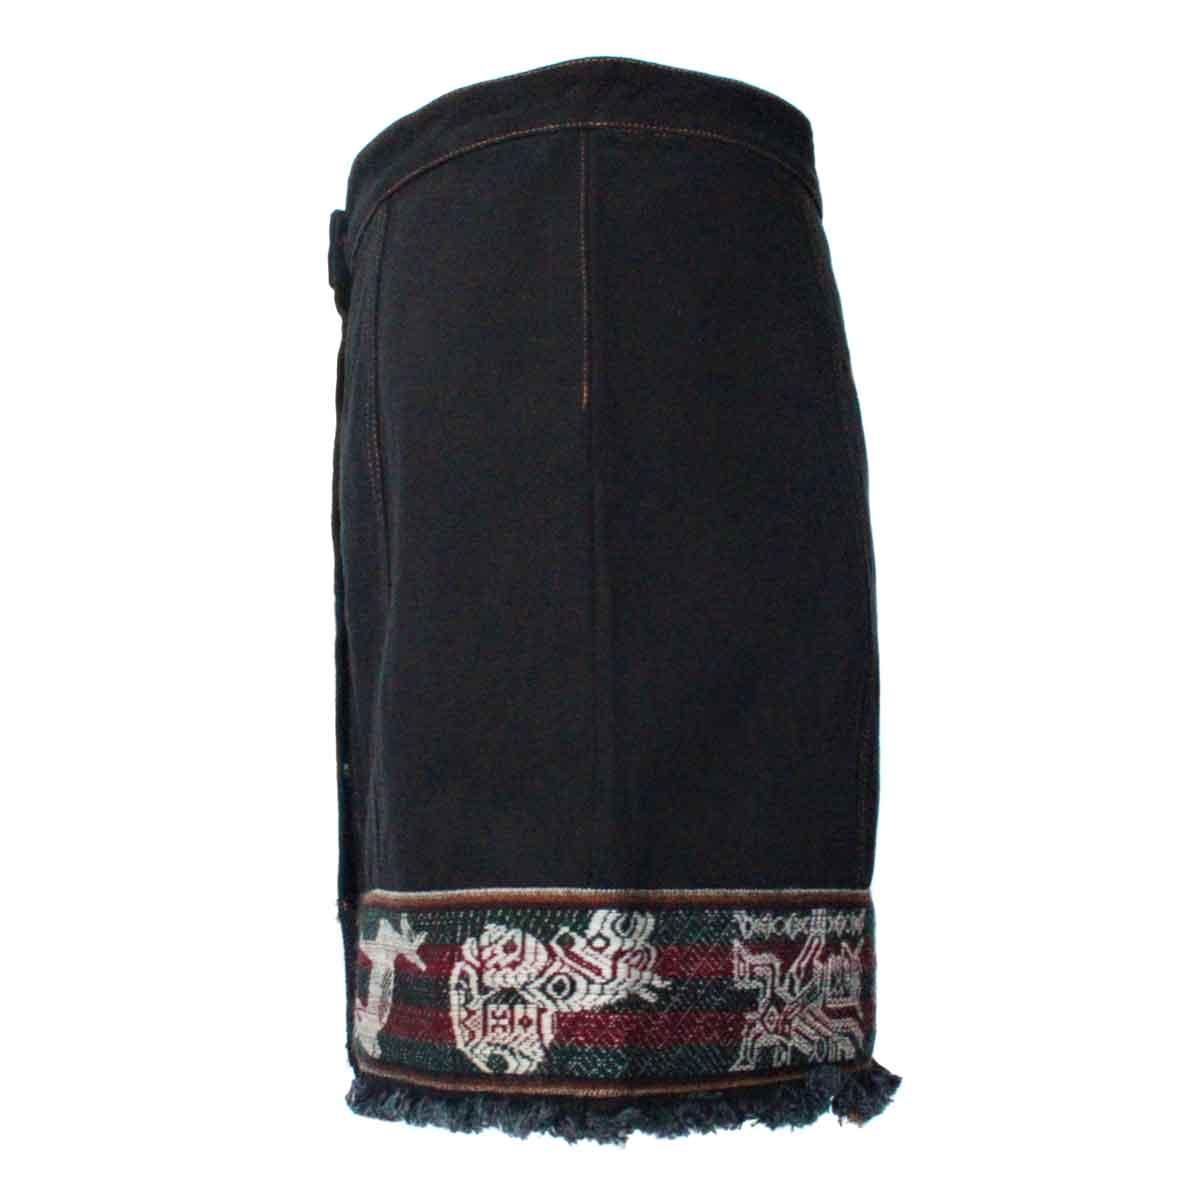 Inka-Products-Mini-jupe Femme Denim Noir-Tissu Traditionnel Andin Bordeaux-2